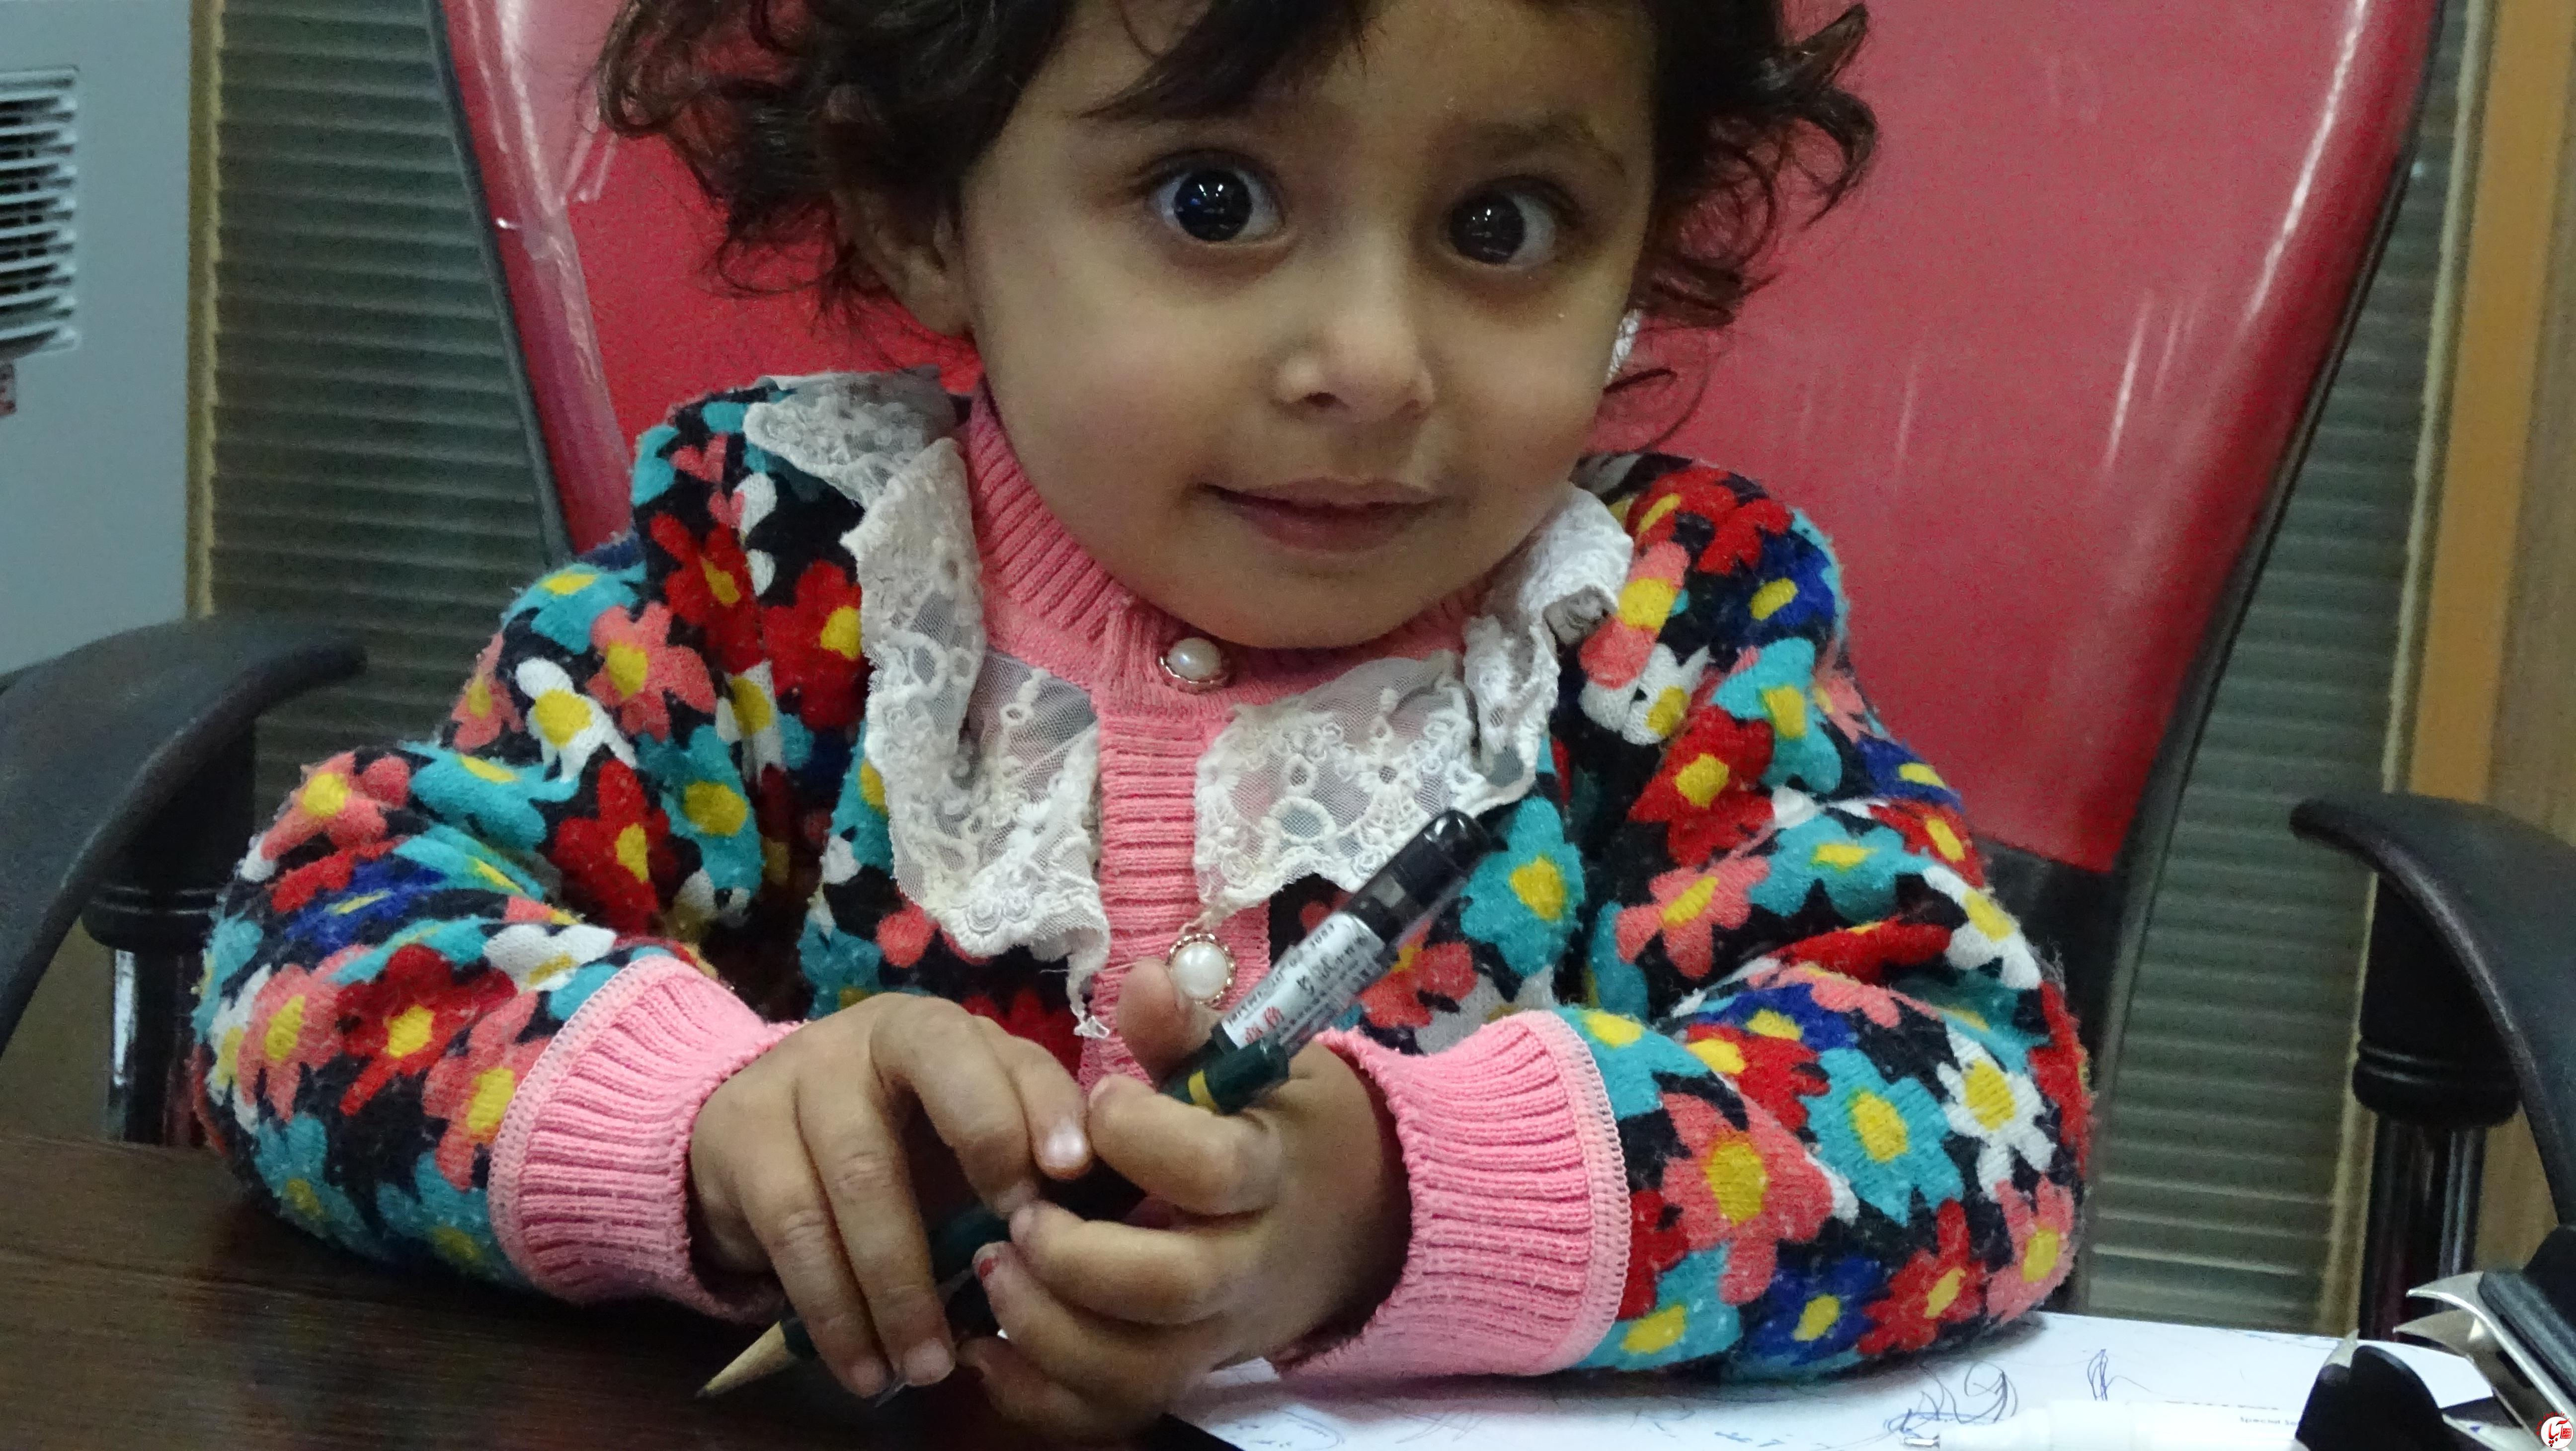 زهرا عزیزی 1 - گالری عکس زمستانه ی کودک آبپا